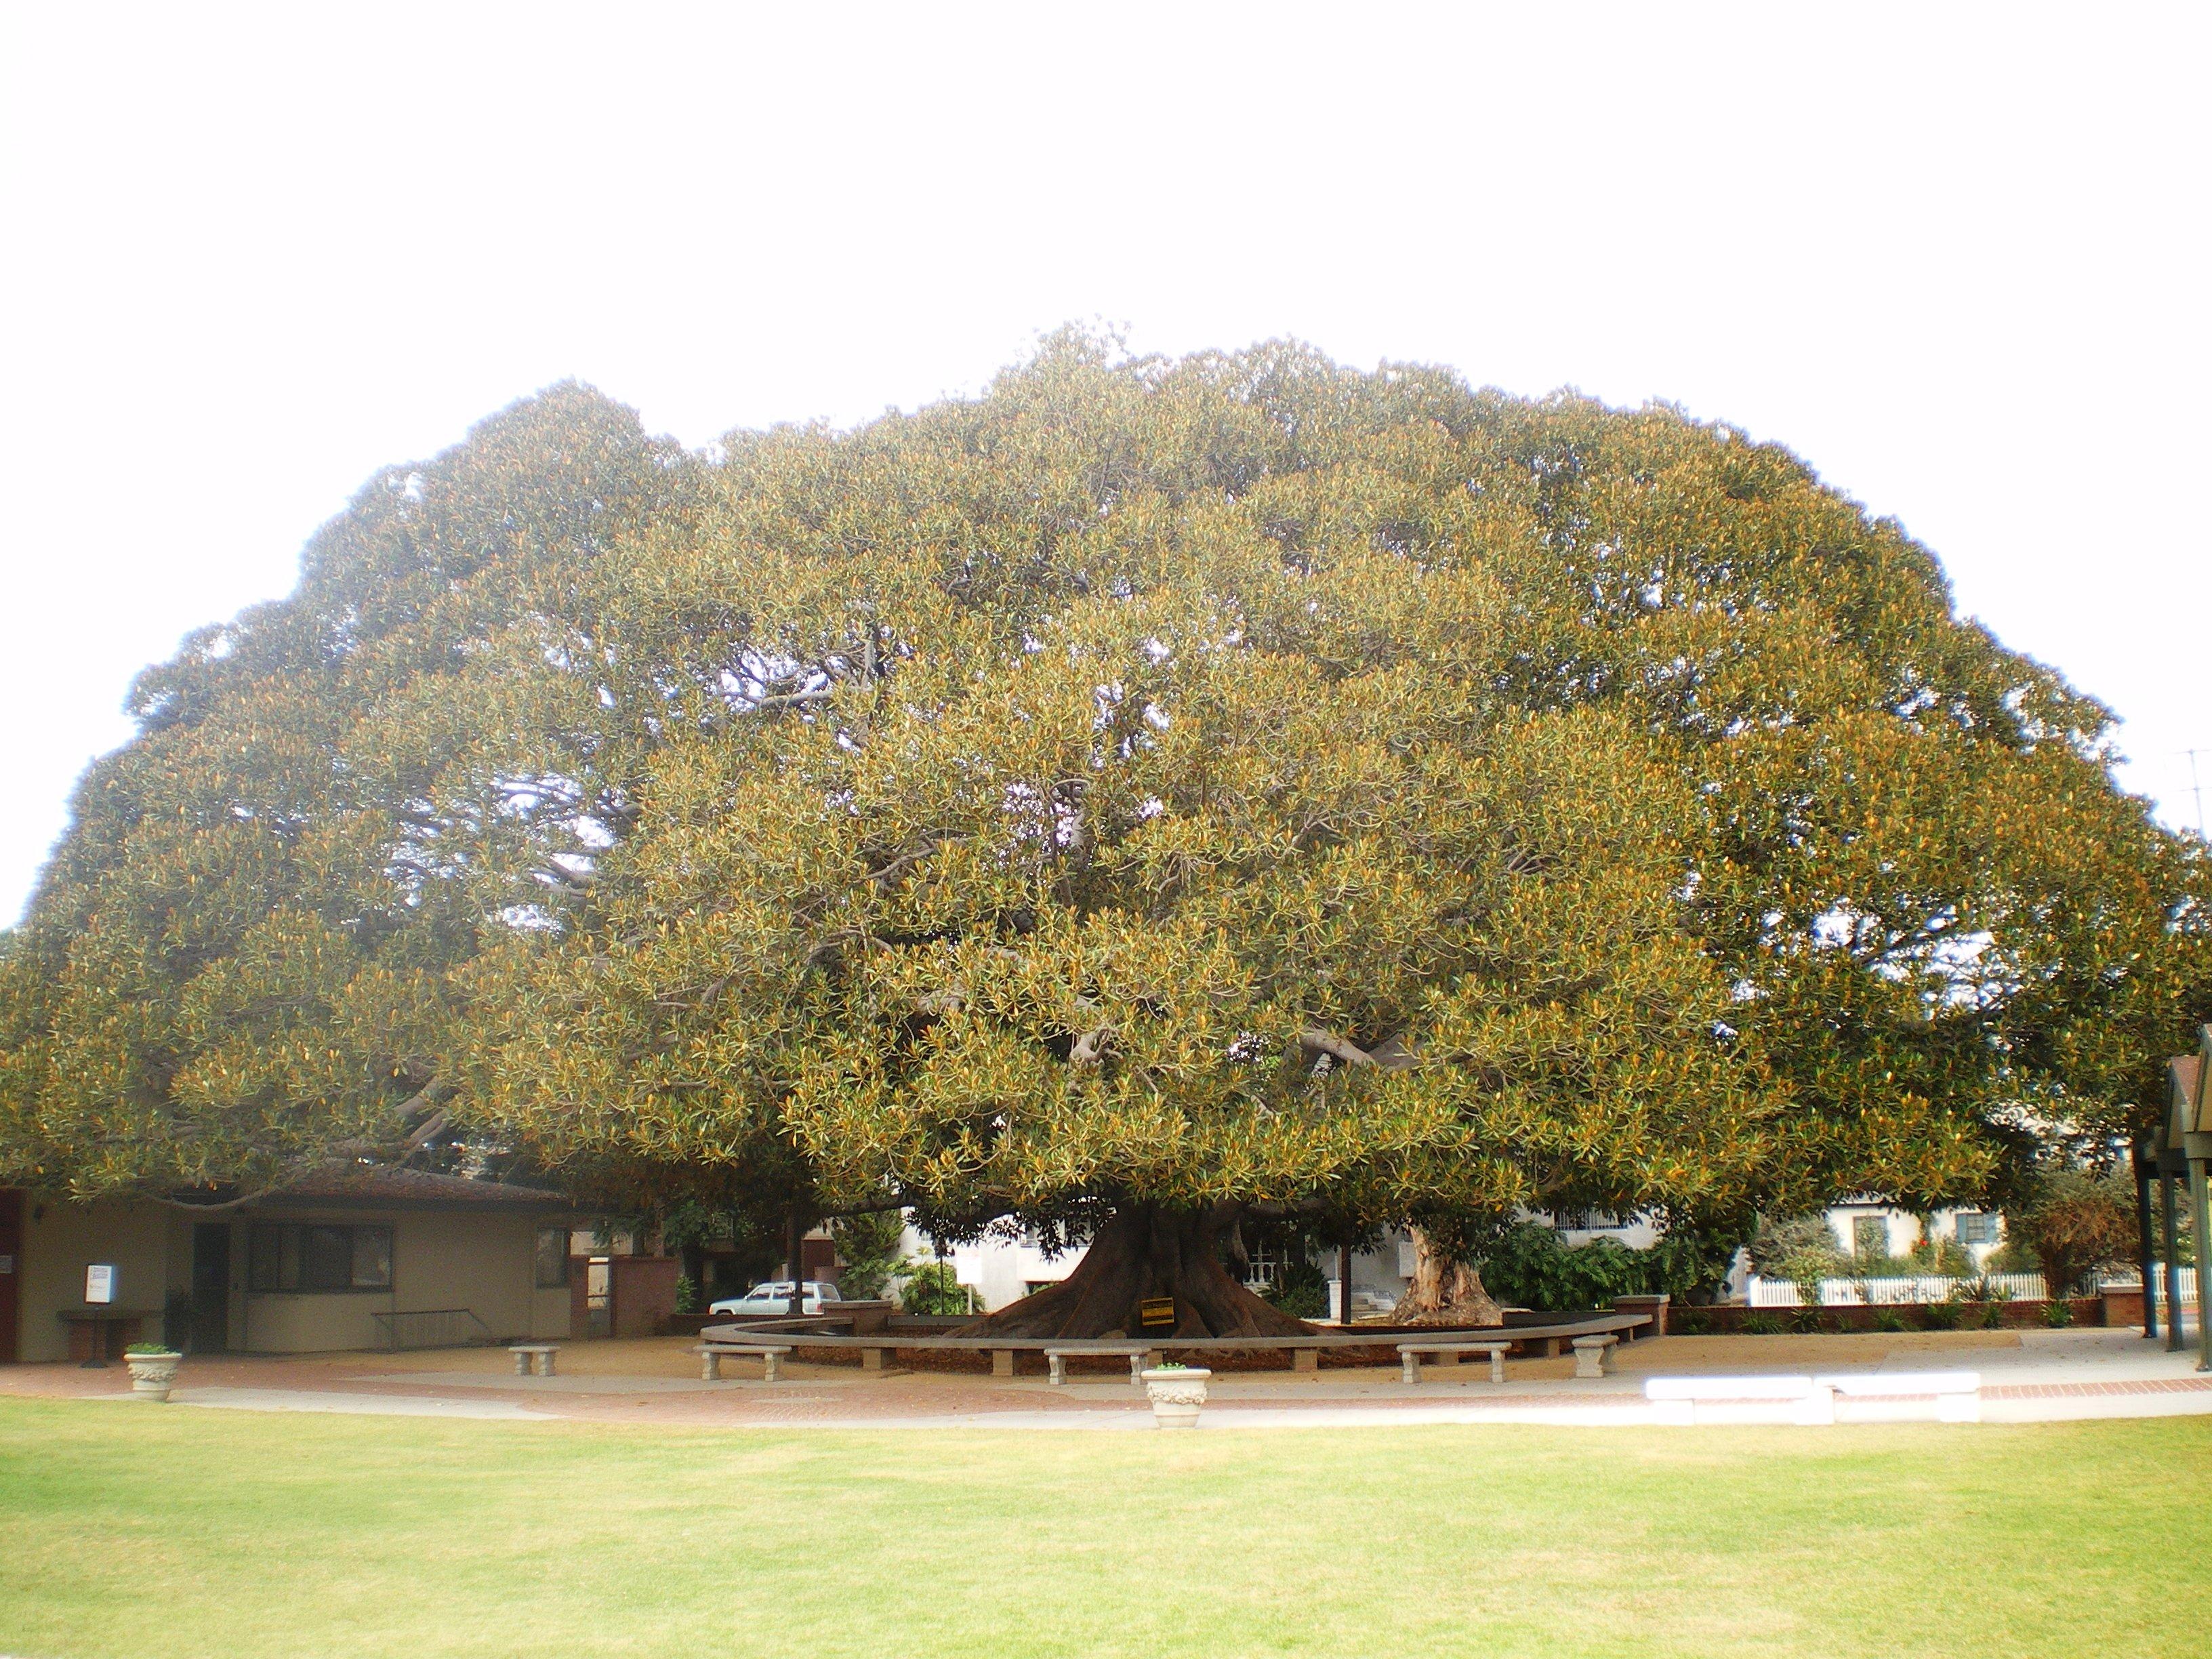 File:Morteton Bay Fig Tree (Los Angeles).jpg - Wikimedia Commons